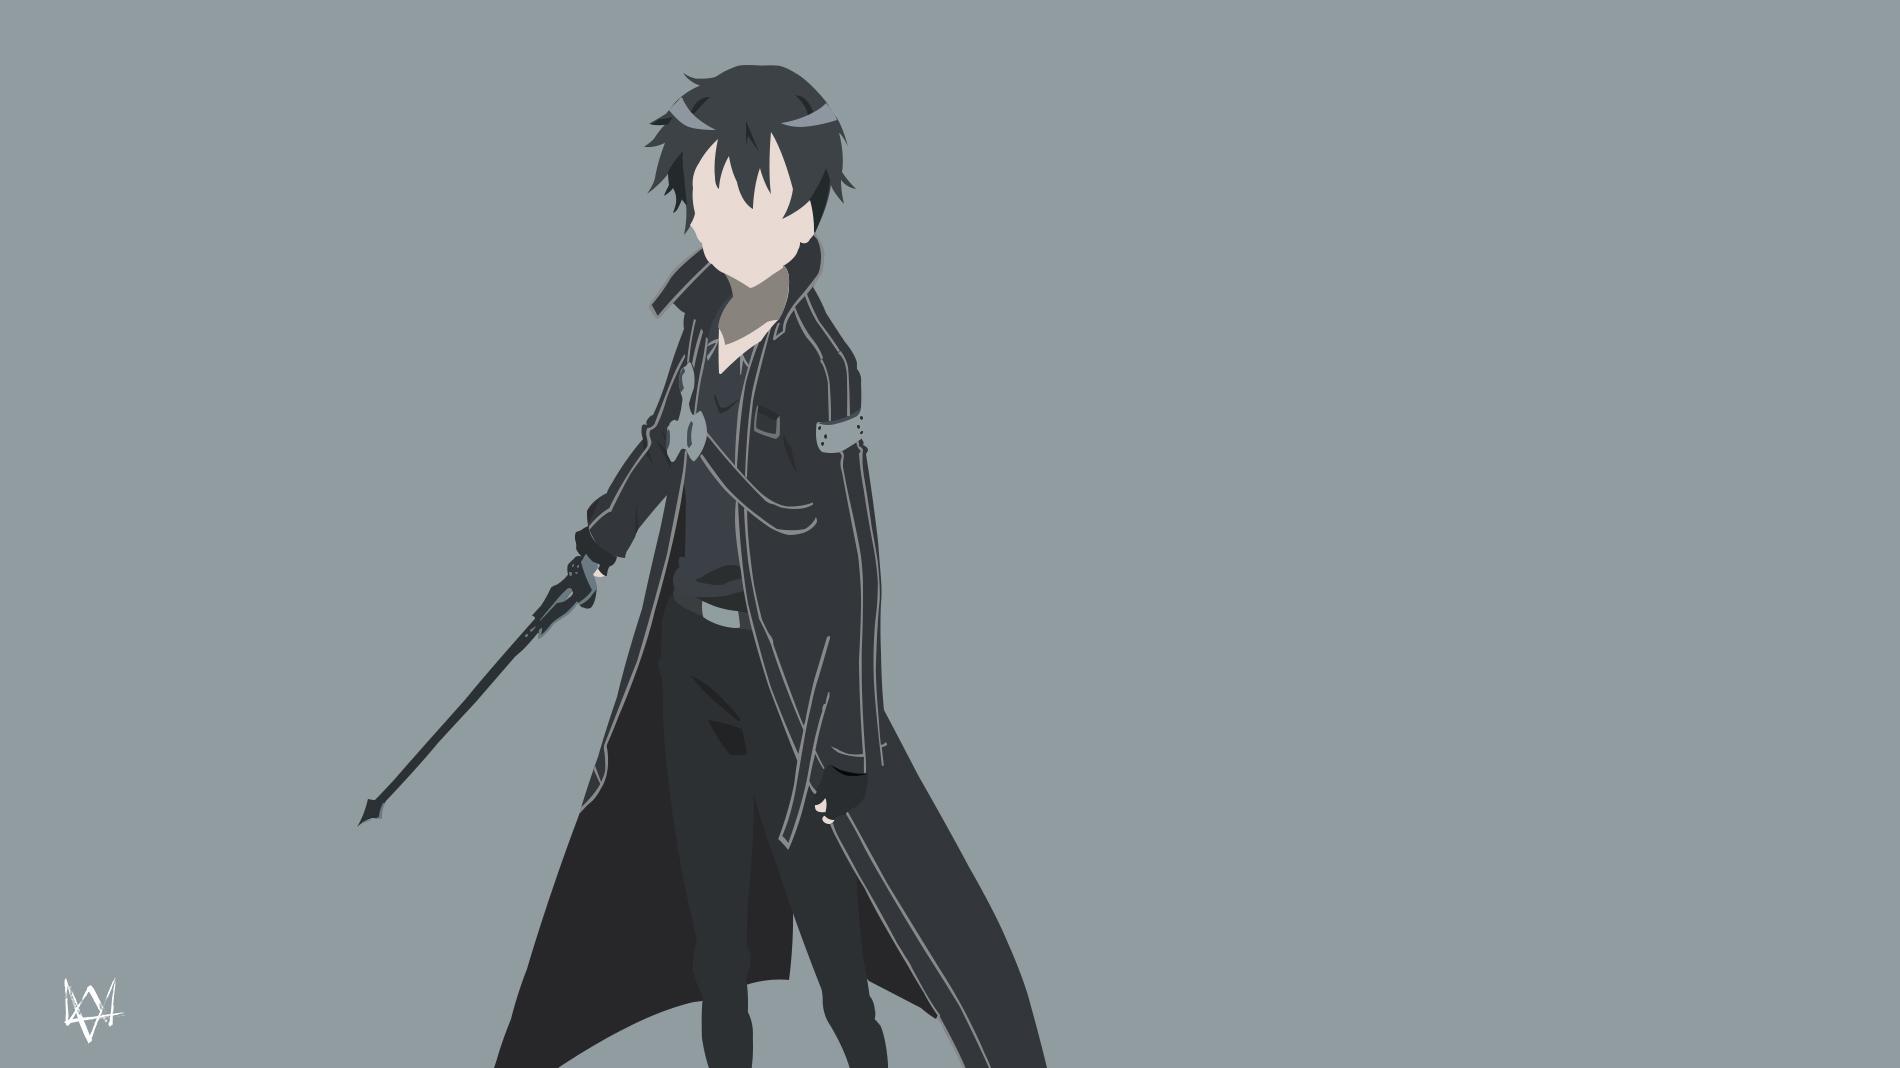 Kirigaya kazuto sword art online minimalist by for Minimal art online